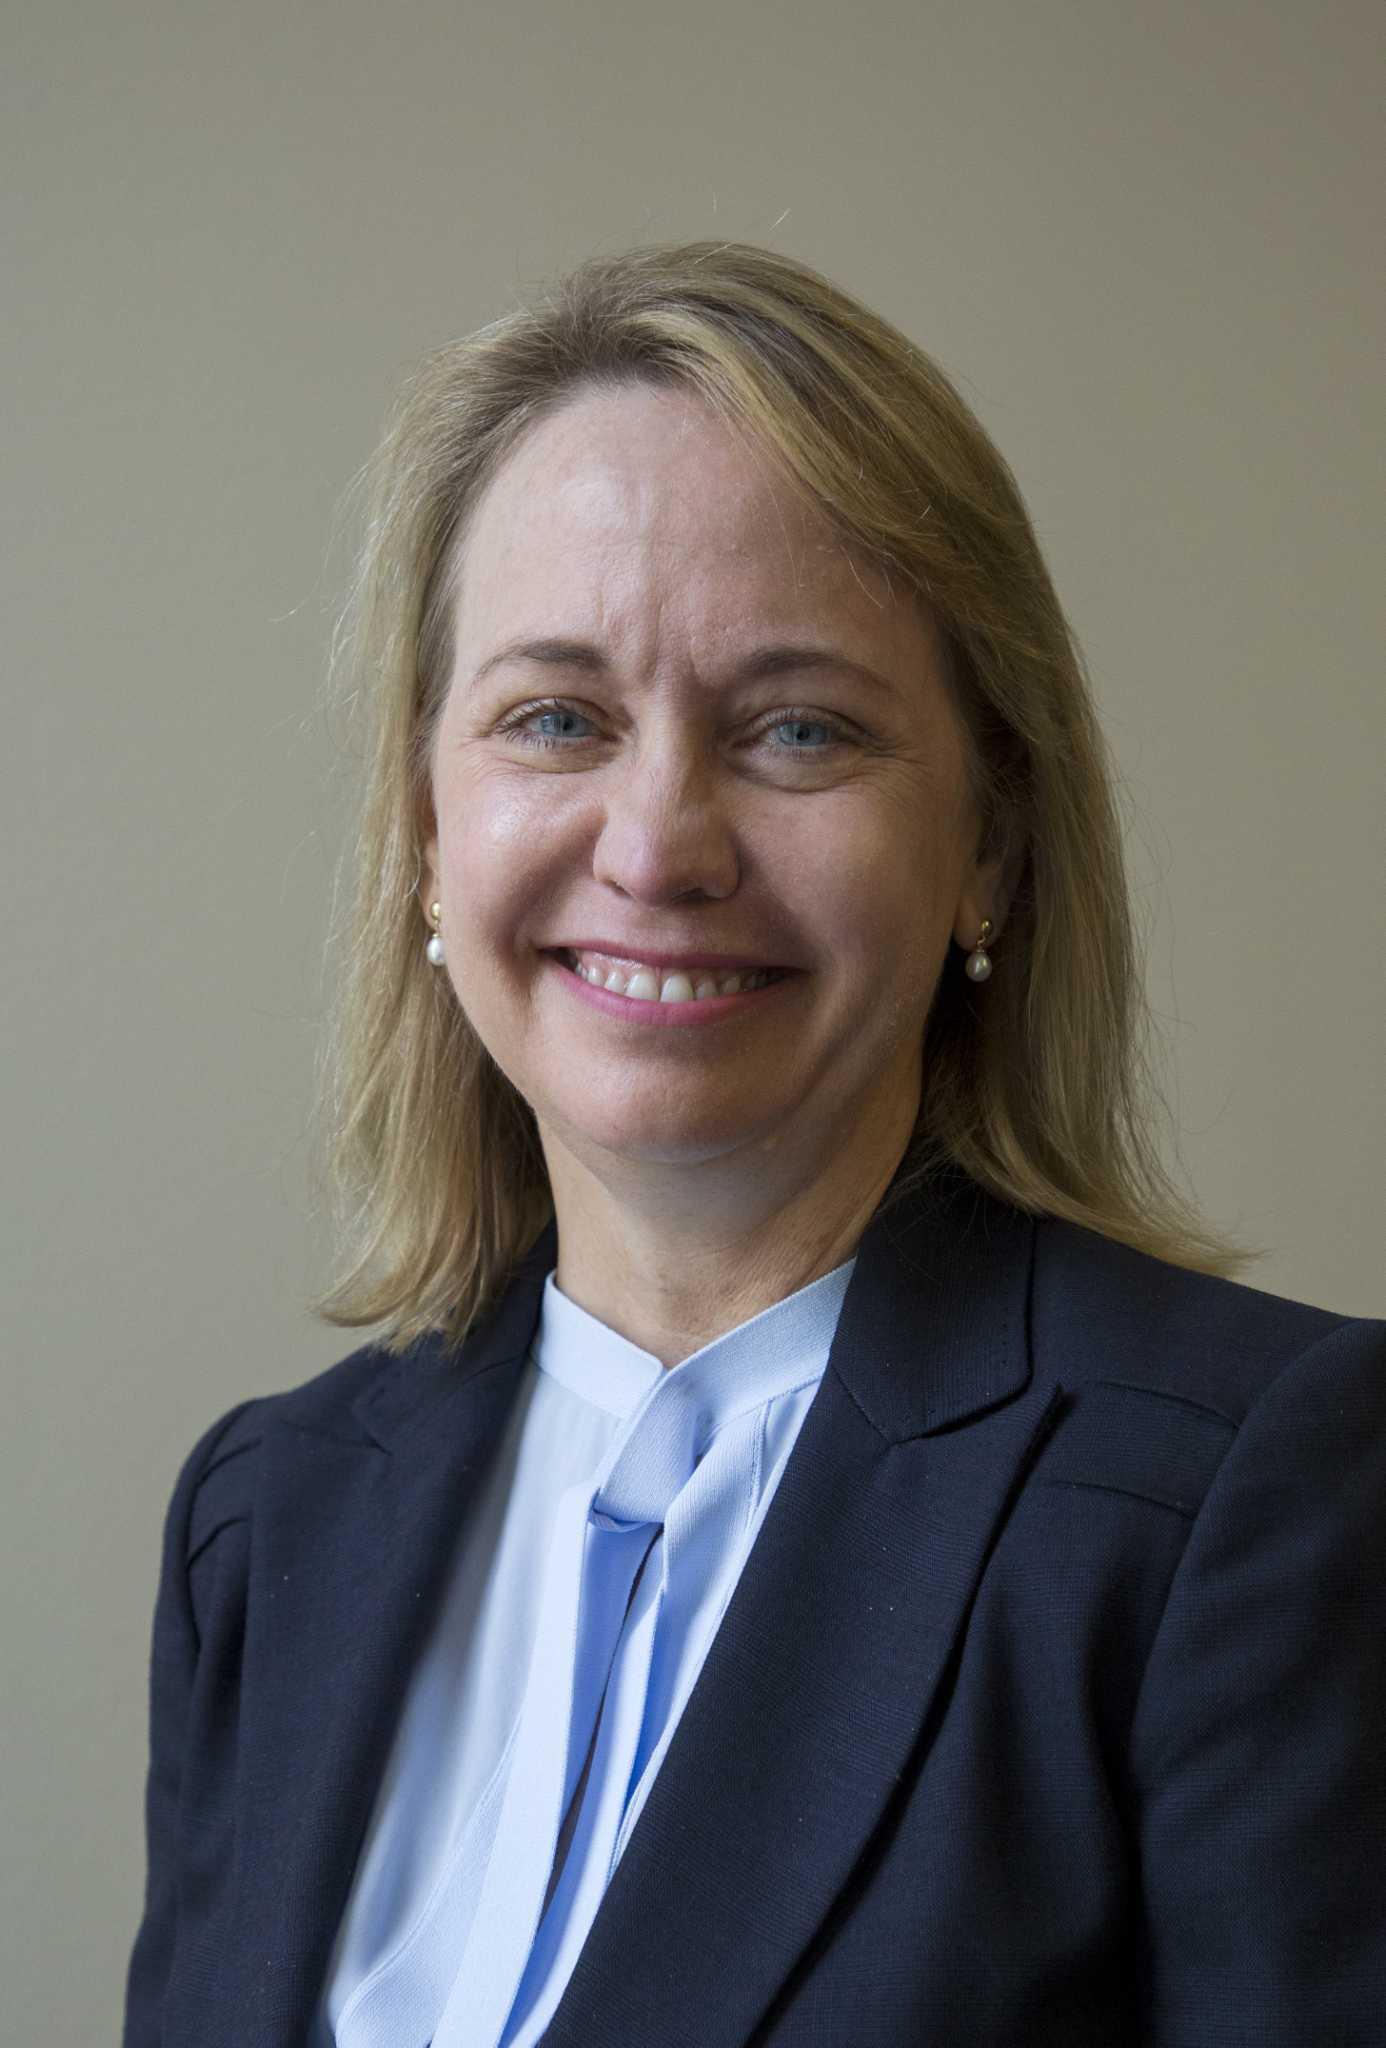 Jane Bland